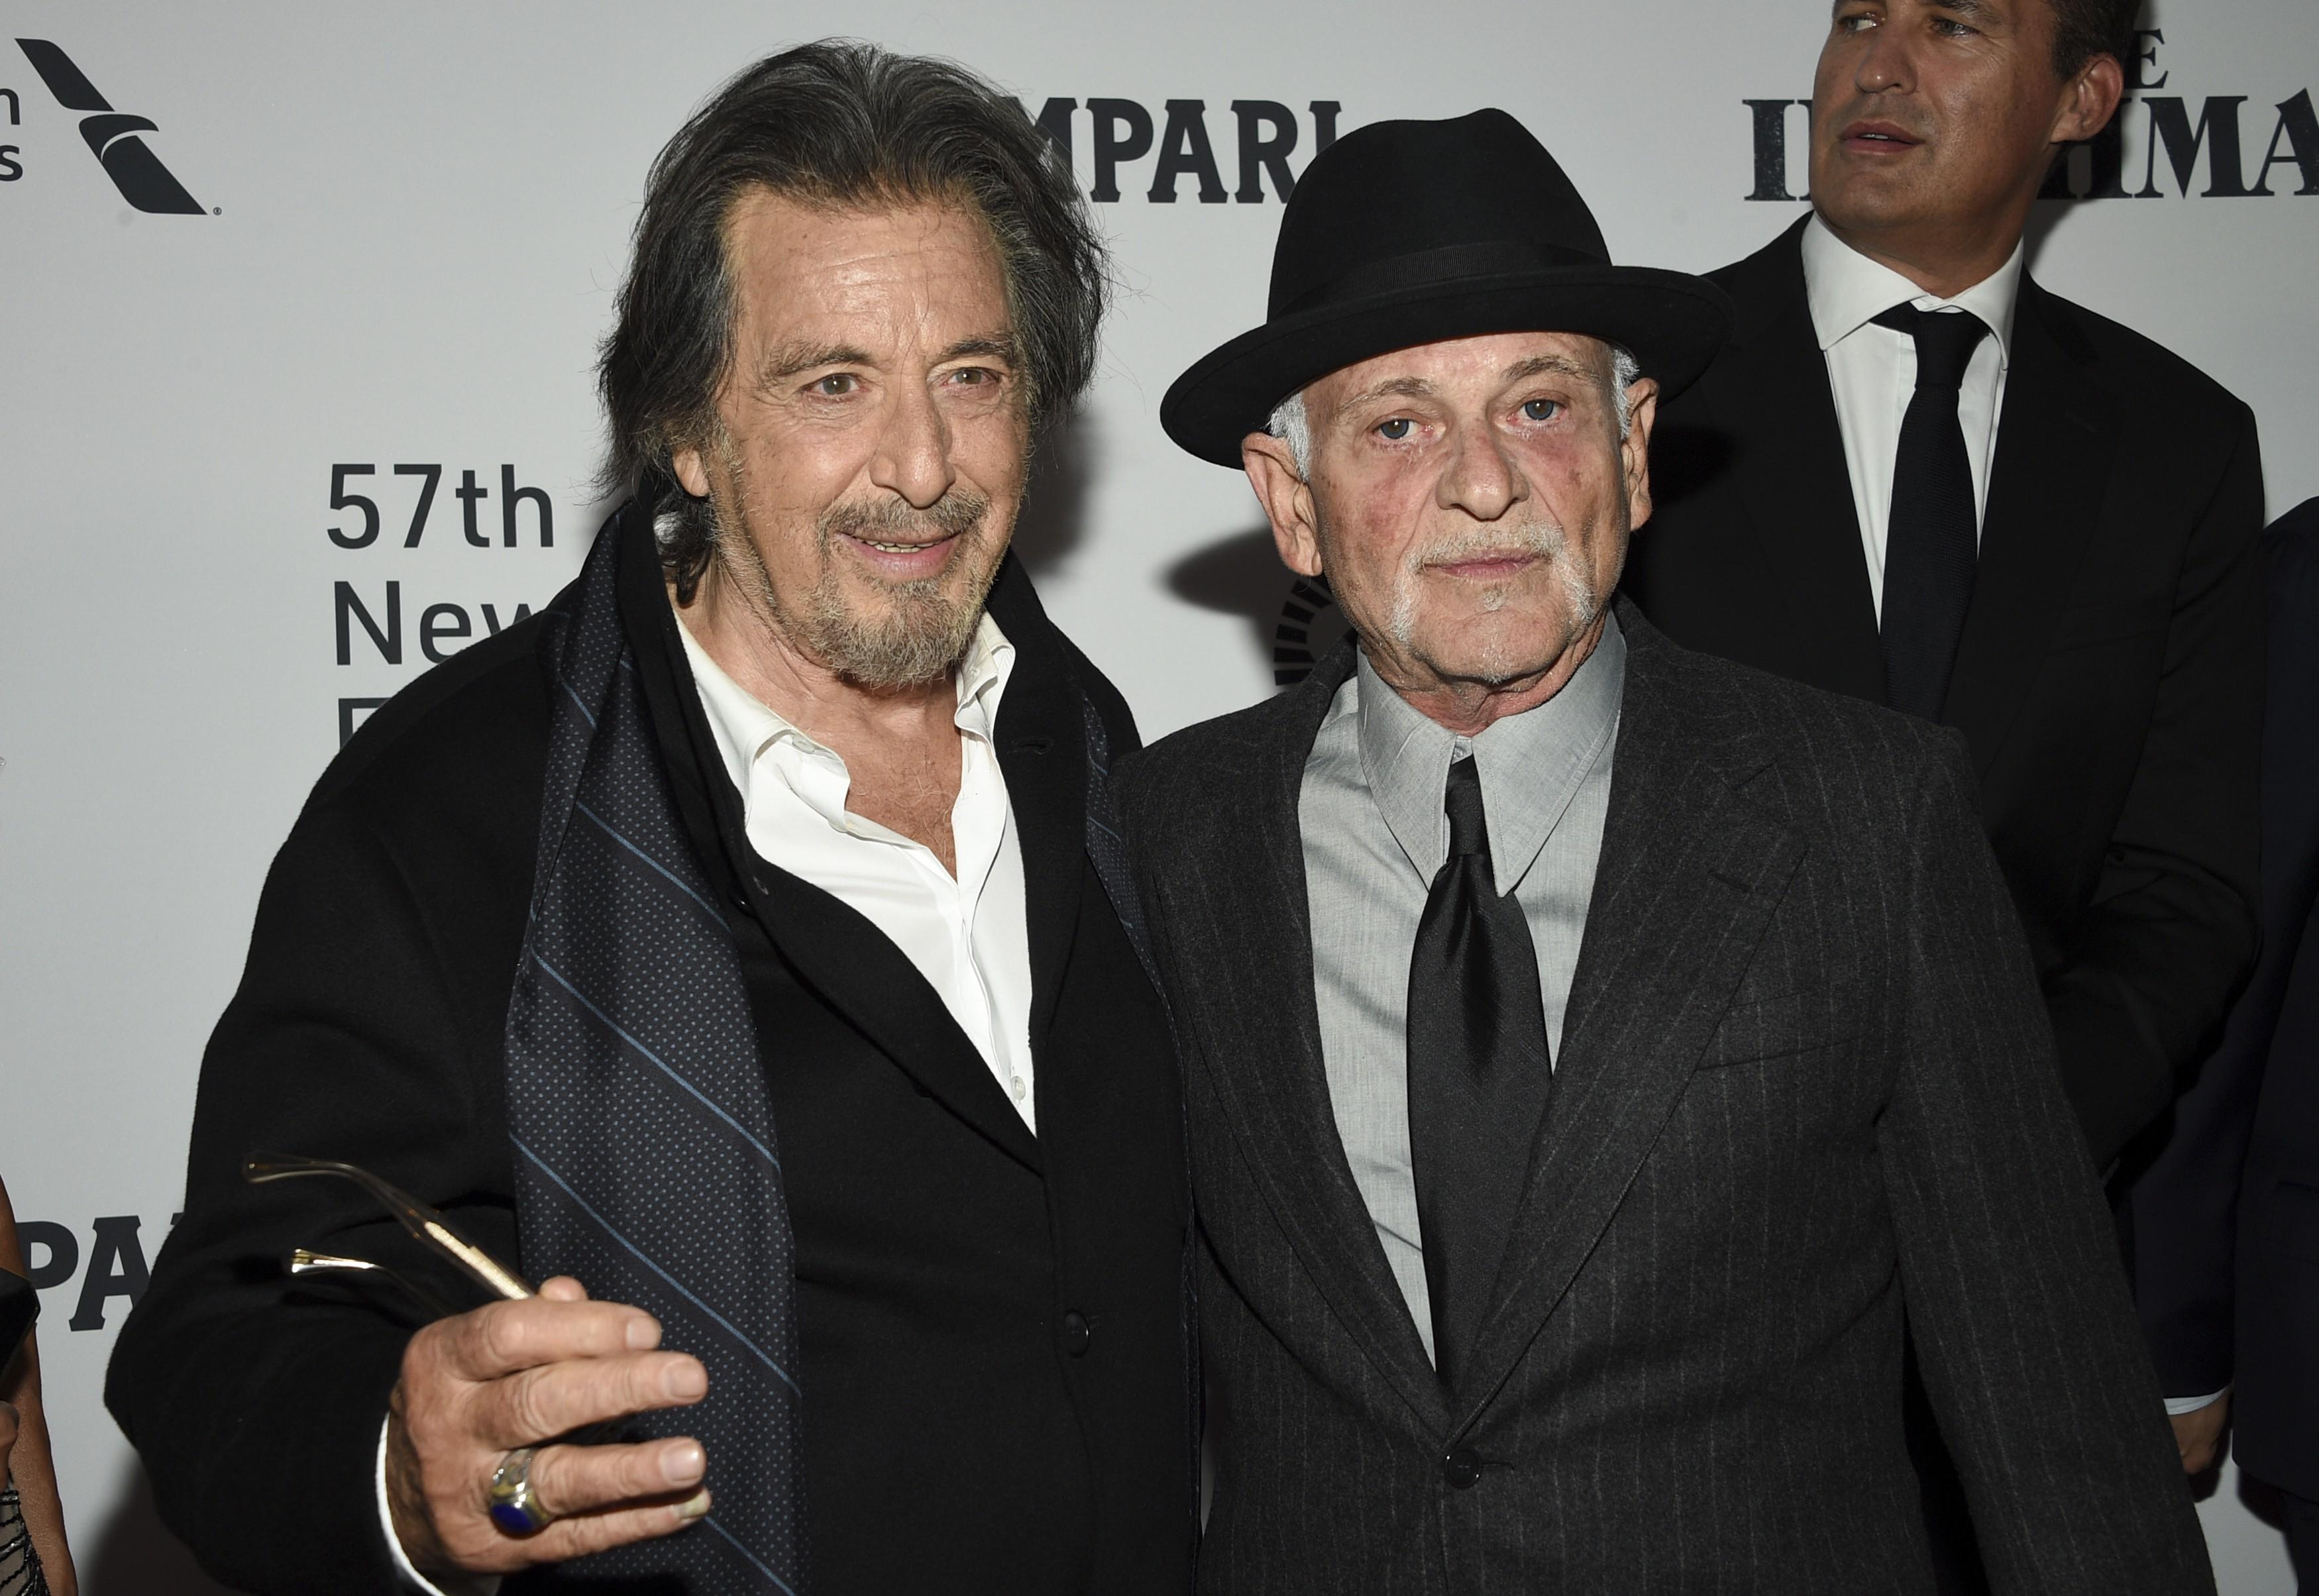 Al Pacino and Joe Pesci